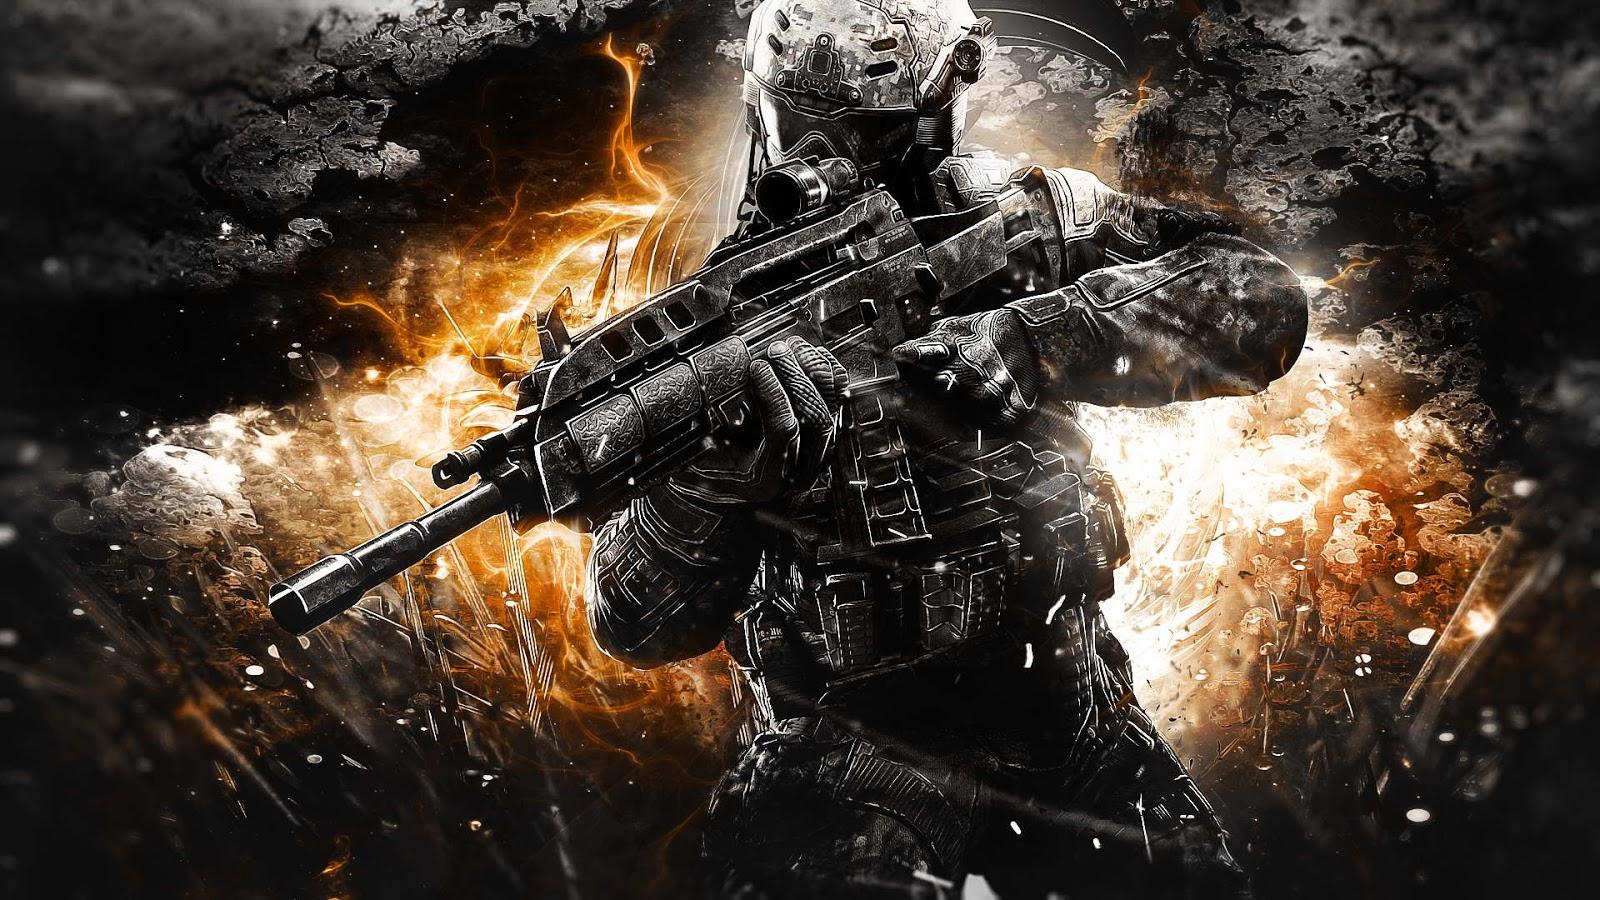 Black Ops Zombies Wallpapers Hd Wallpape Hd Wallpaper Gwpyop GamesHD 1600x900